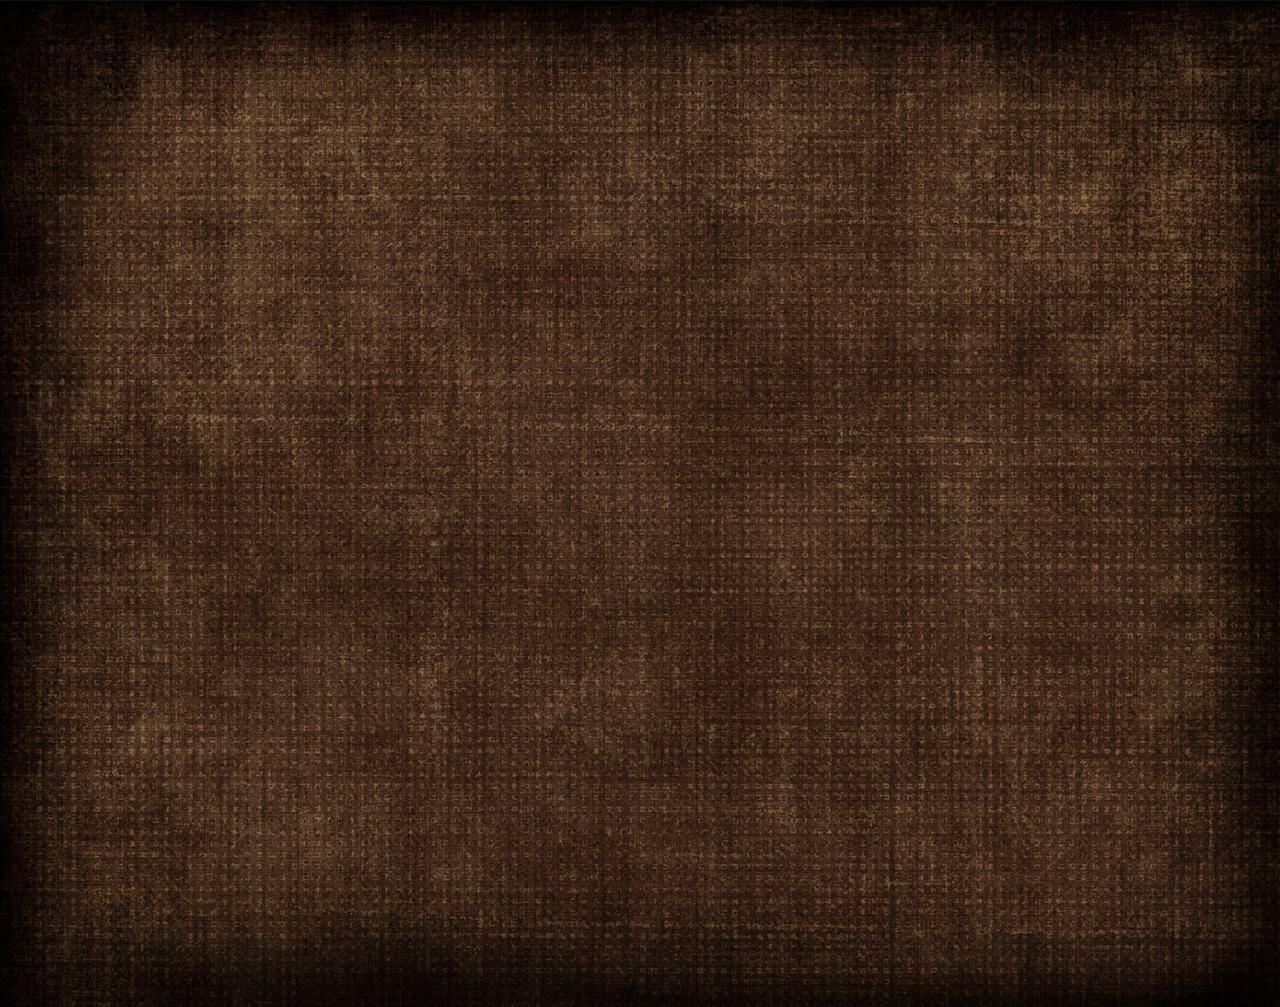 brown wallpaper high resolution - photo #20